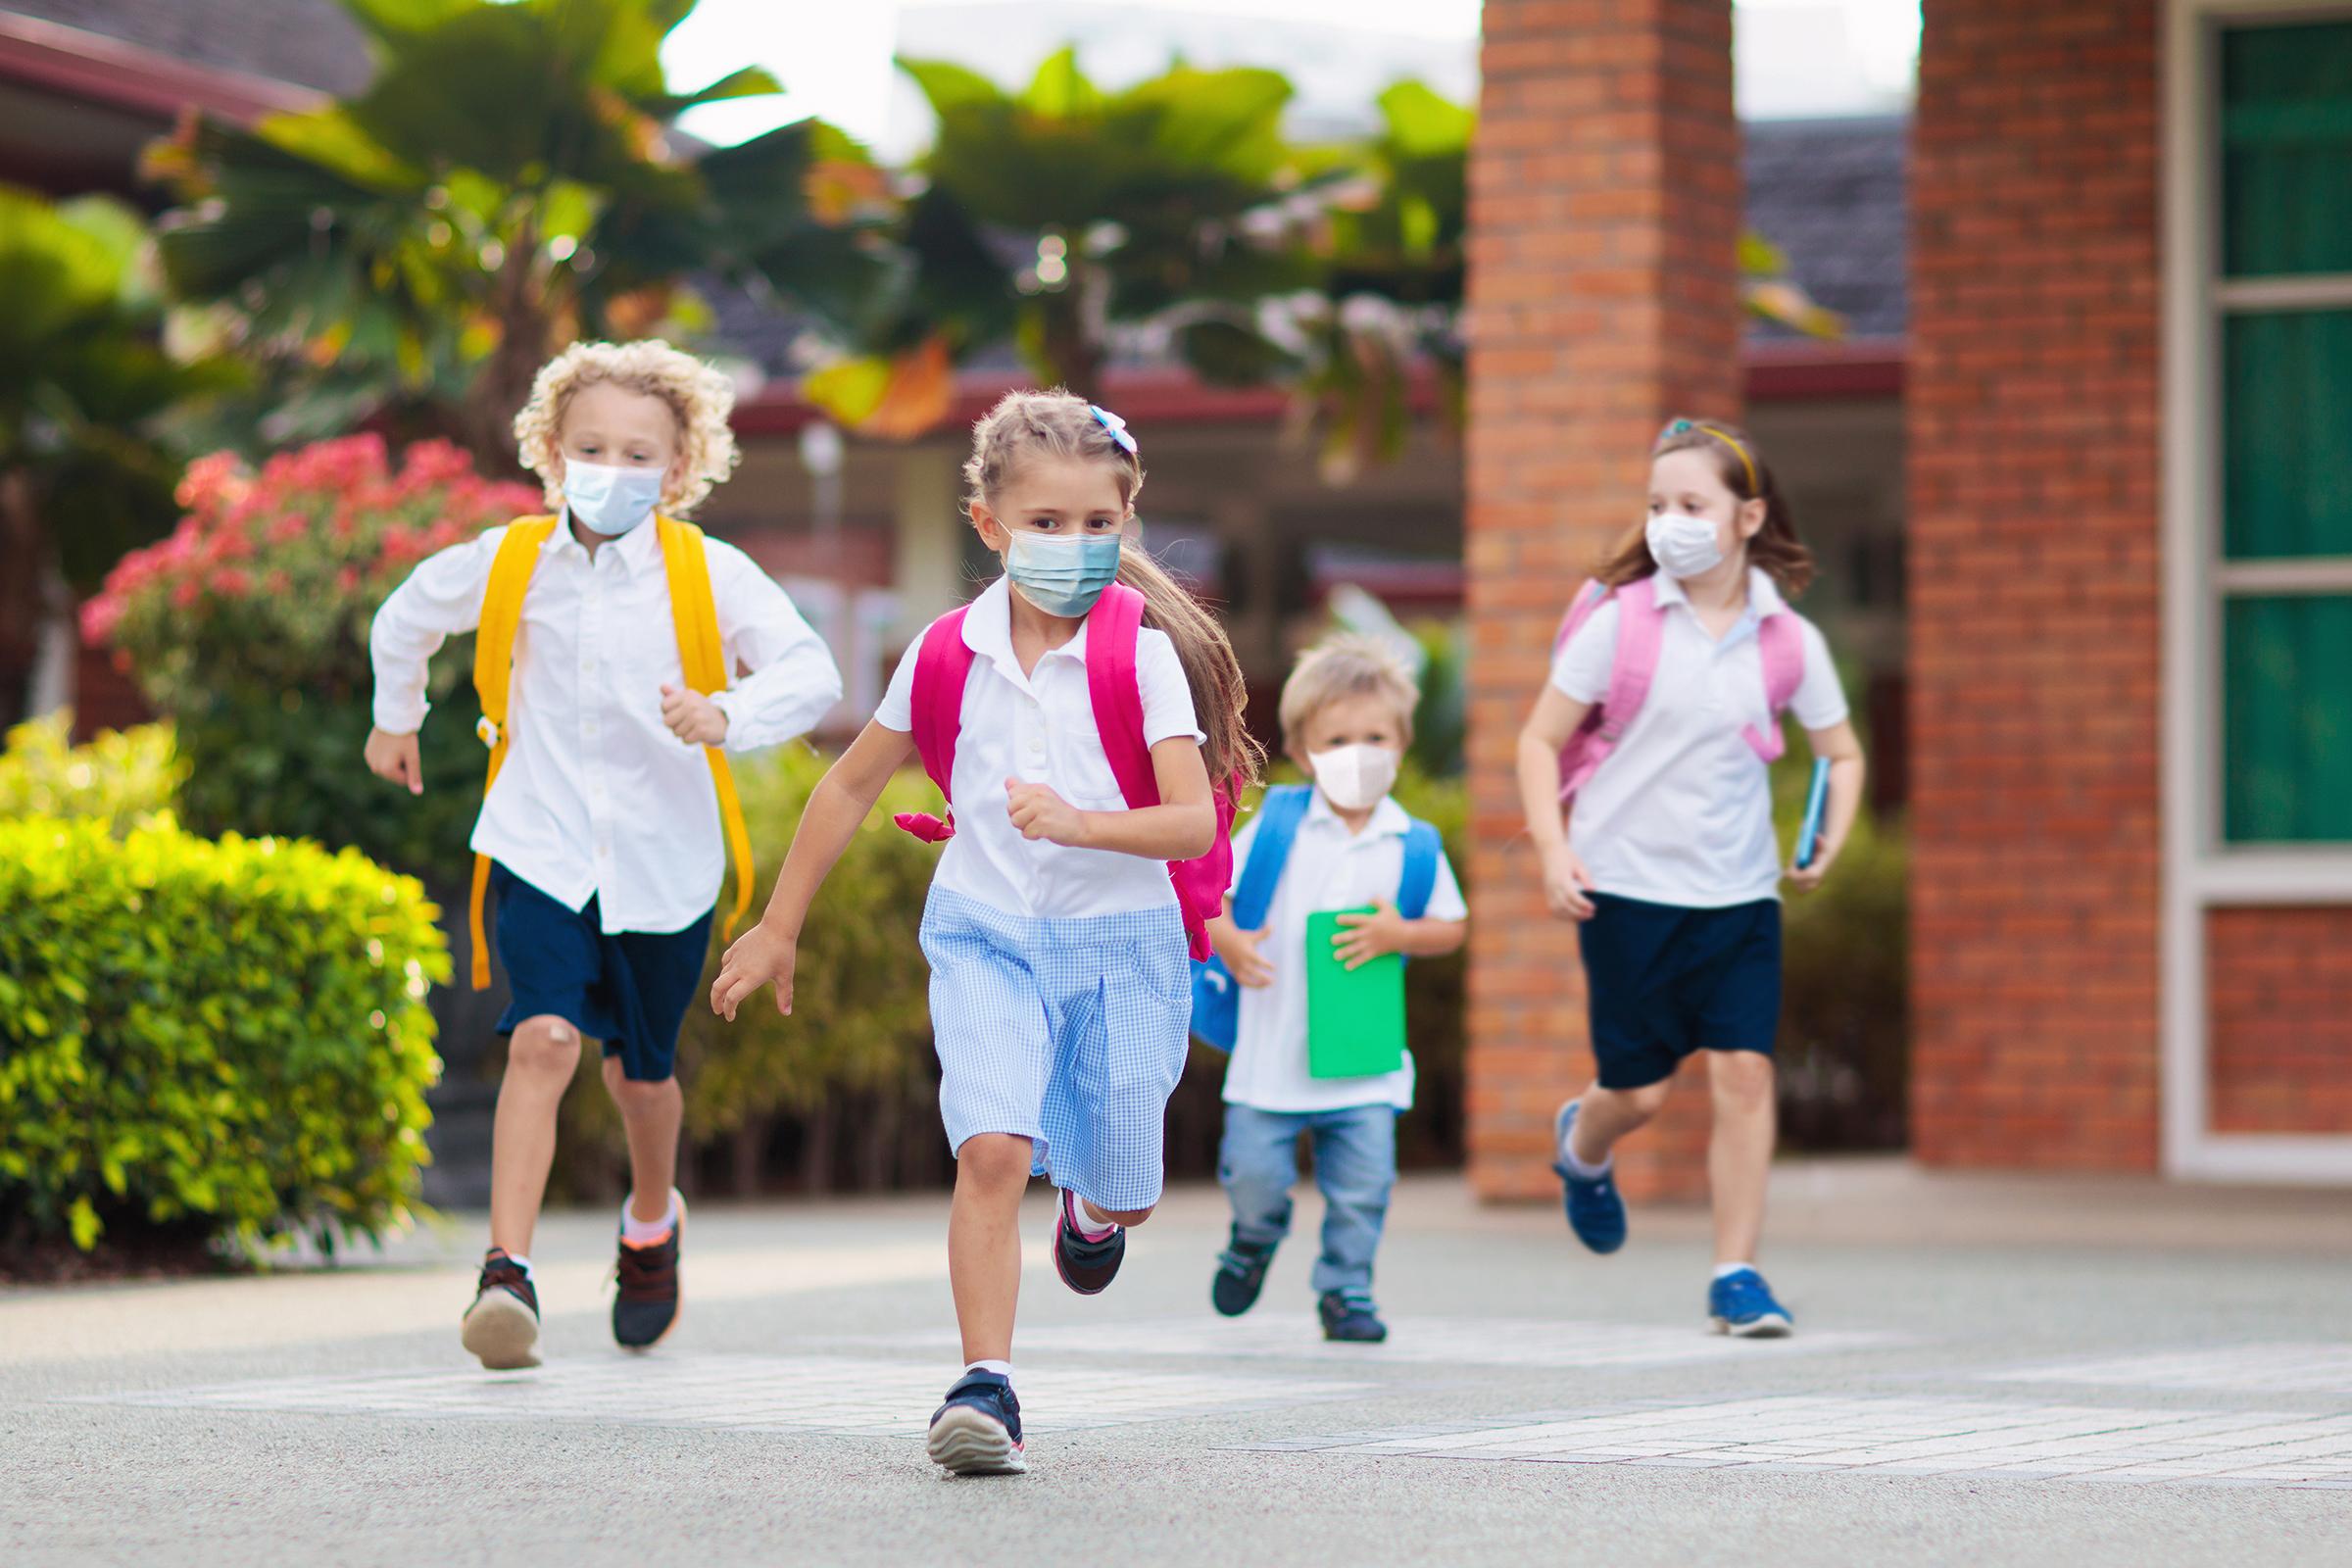 Children wearing masks playing at school